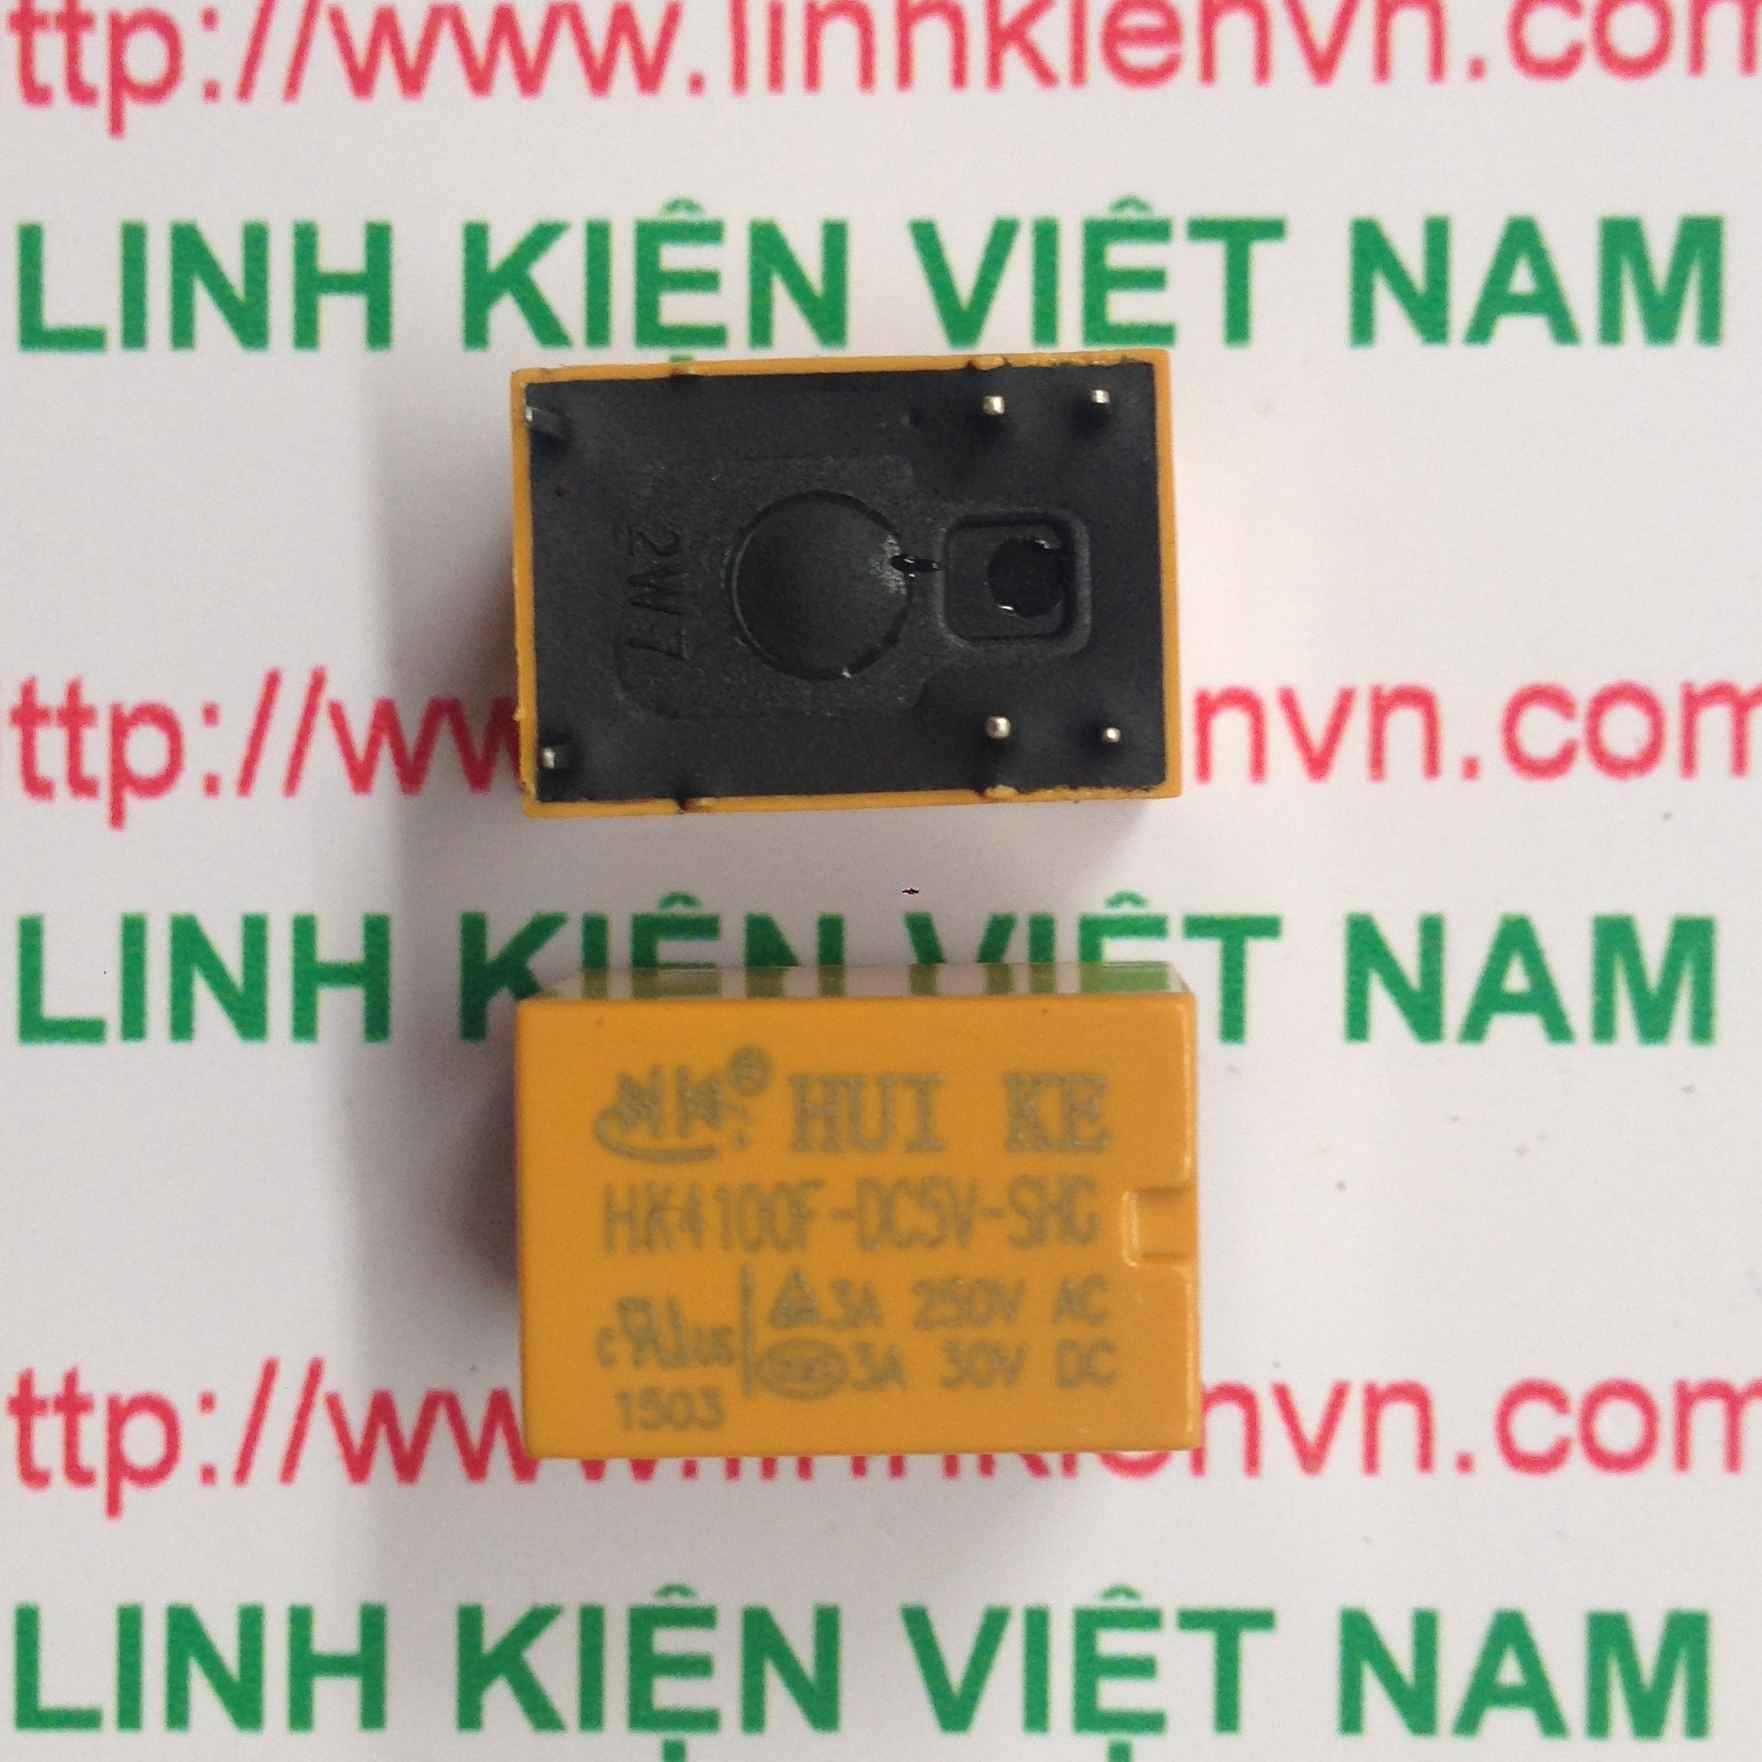 Relay Huike 1 cặp tiếp điểm 5V-3A | HK4100F-DC 5V-SHG - A1H1(KB4H3)